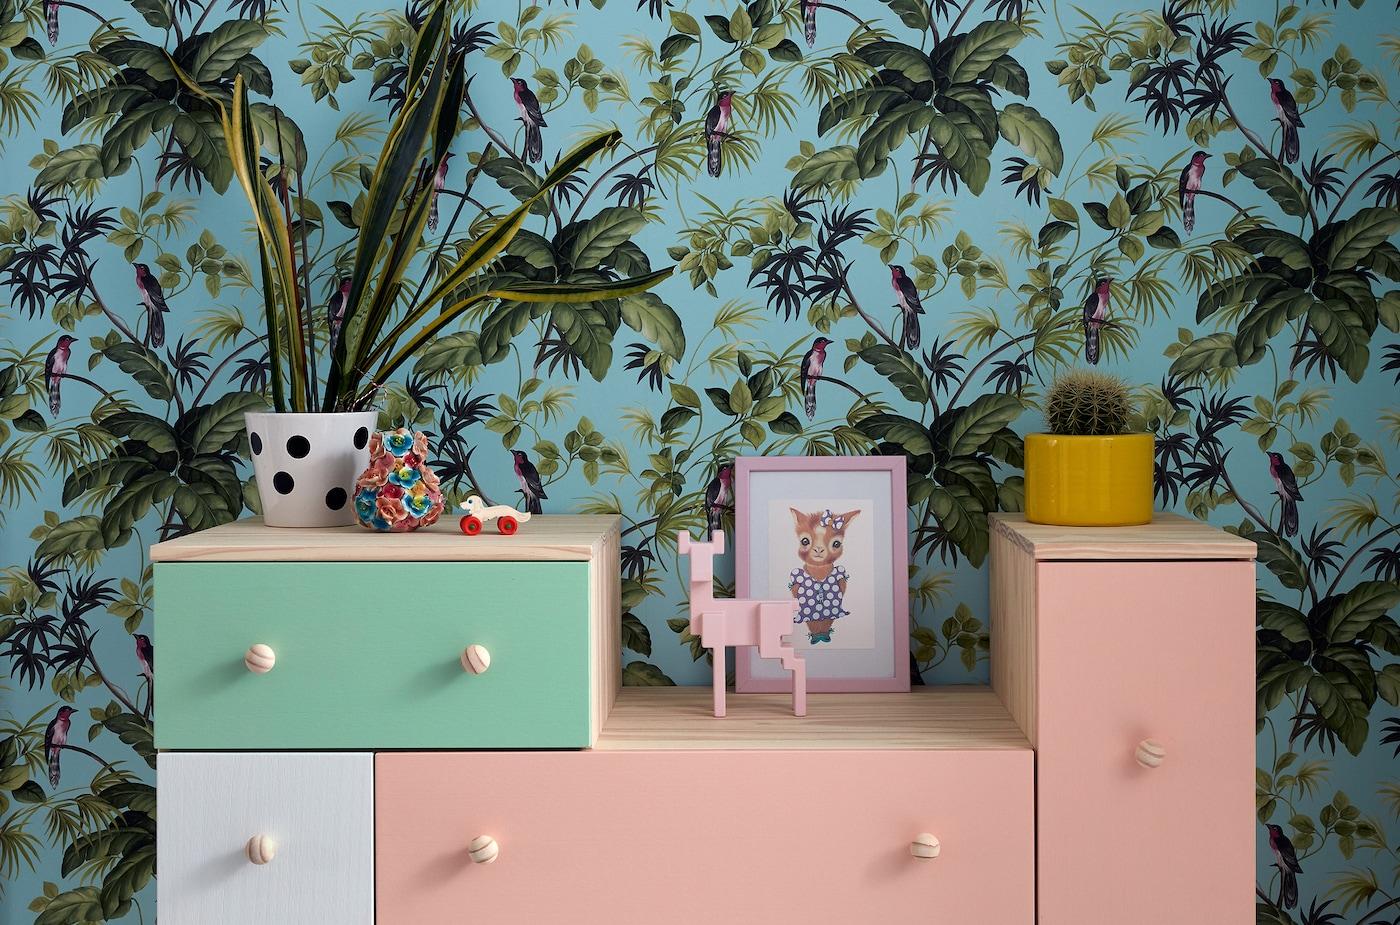 m bel mit farbe aufpeppen ikea. Black Bedroom Furniture Sets. Home Design Ideas